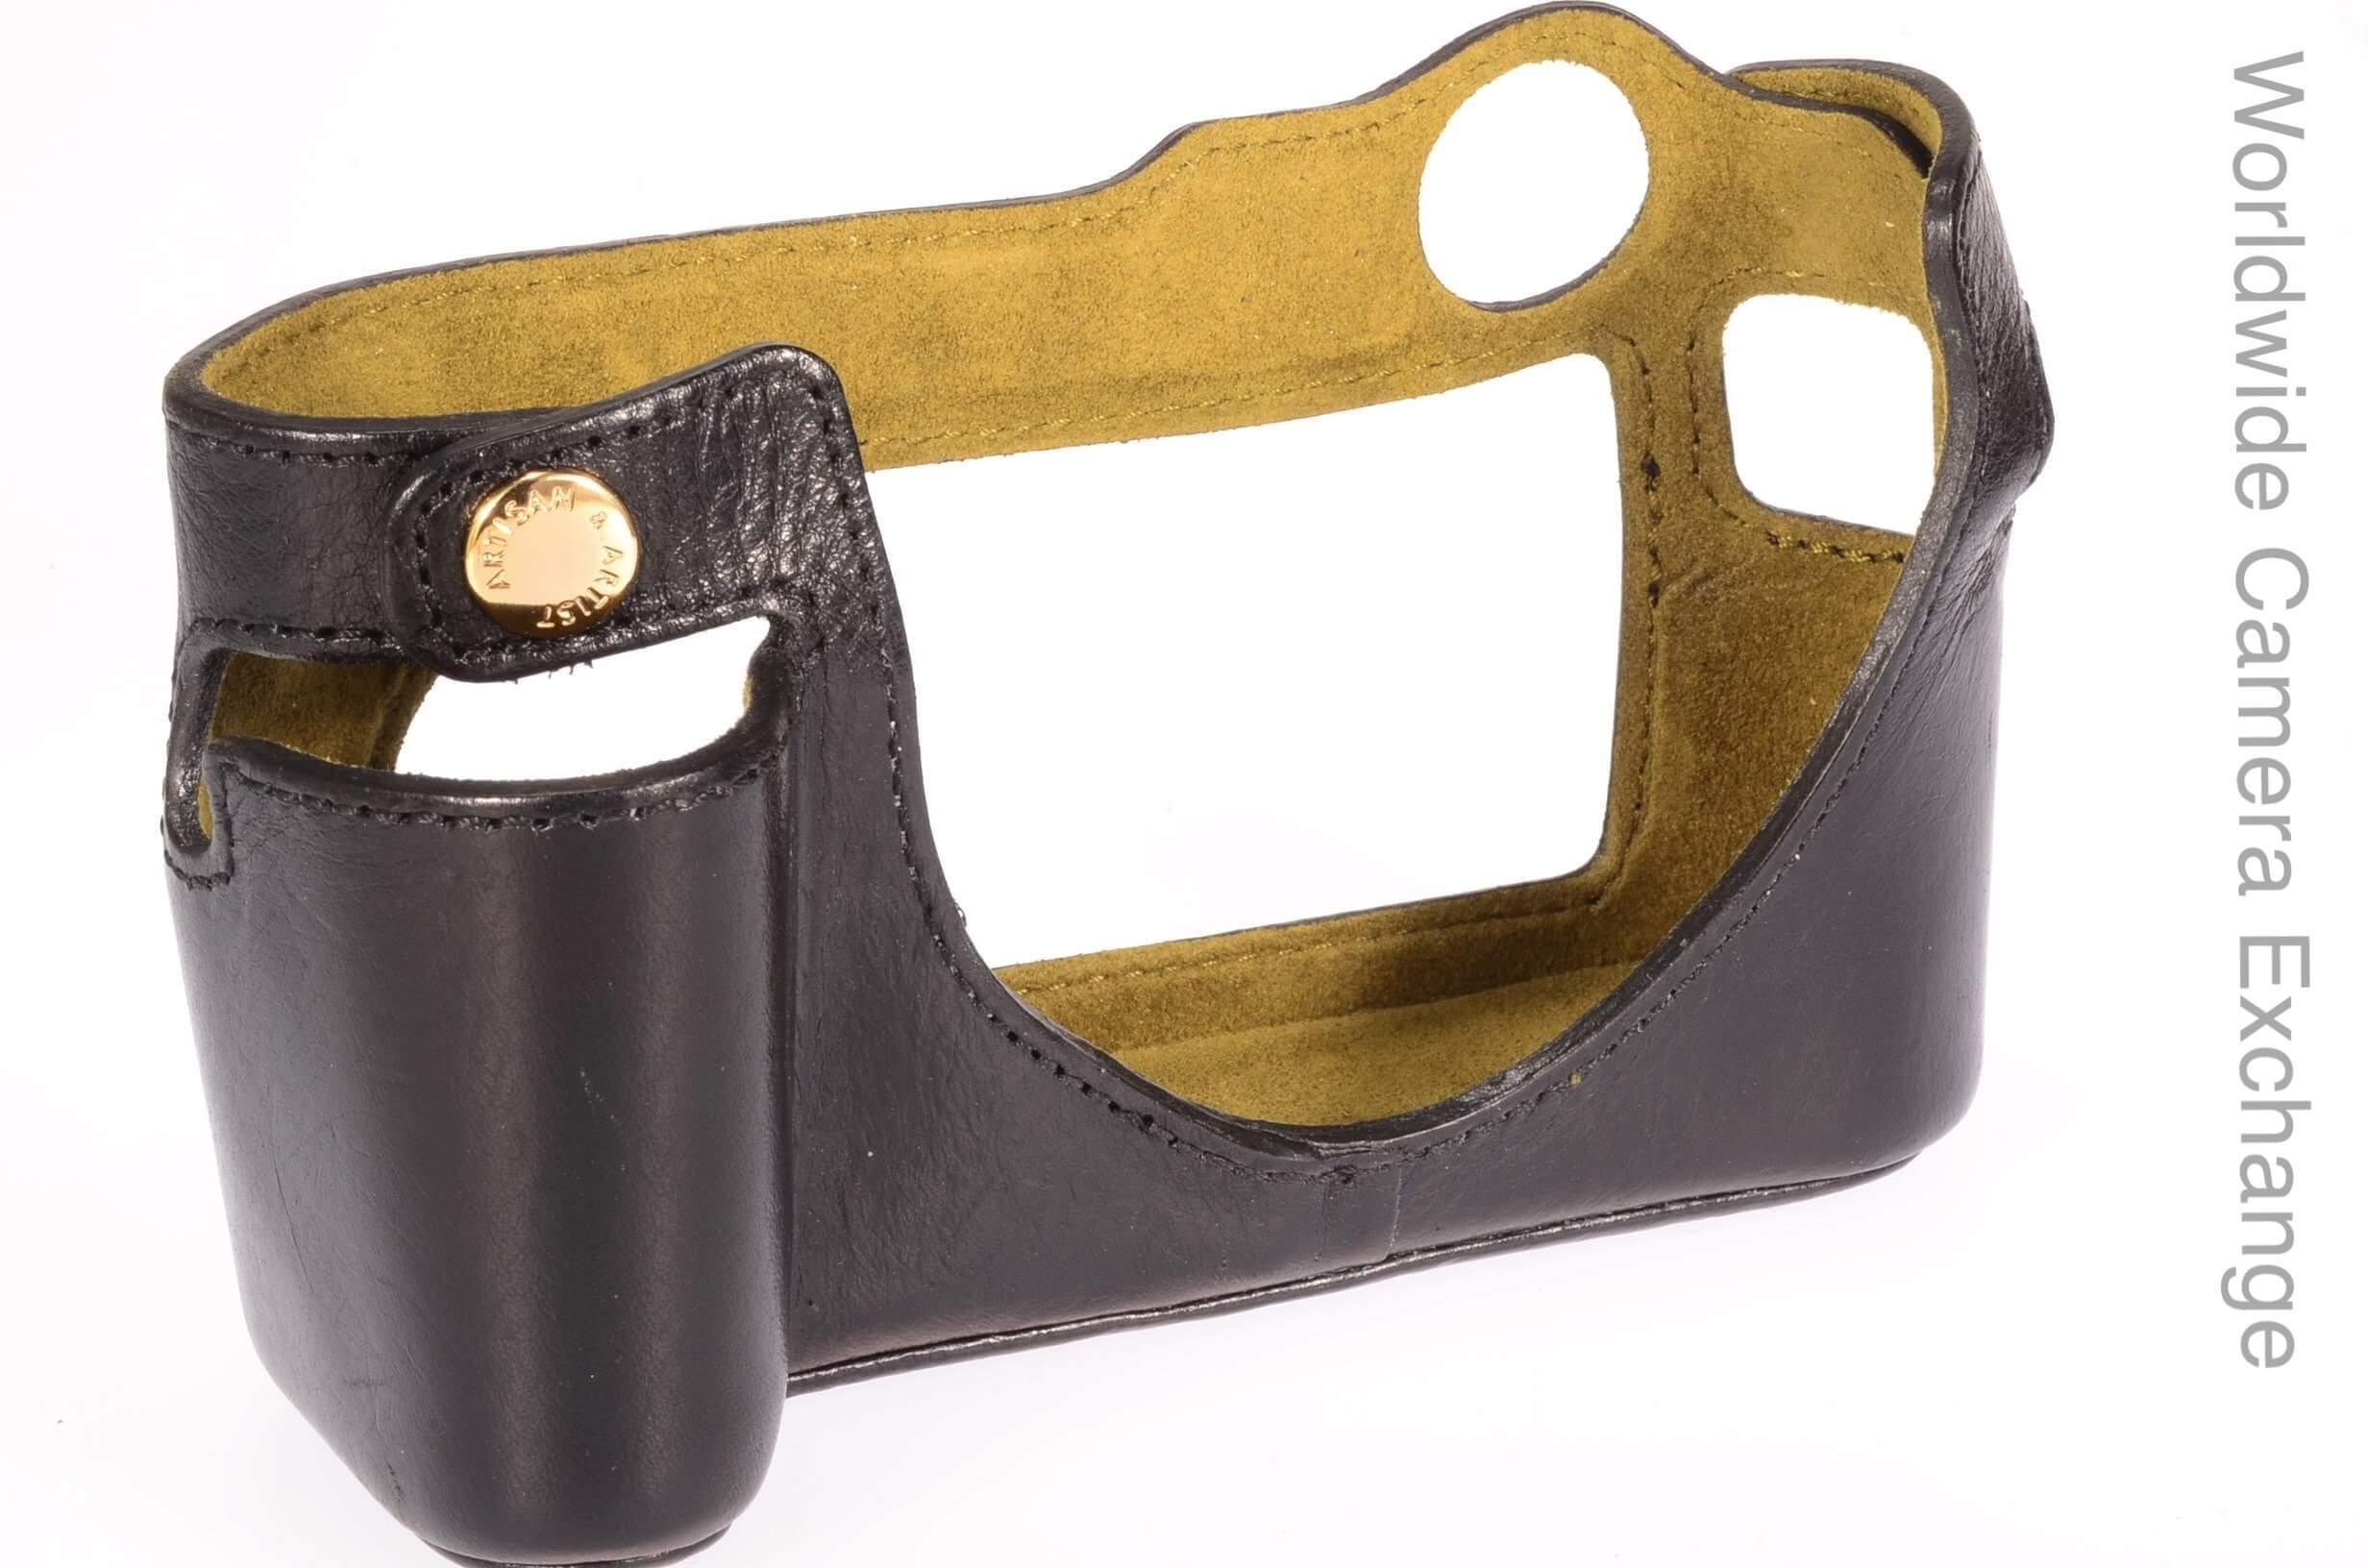 Artisan & Artist case for Leica M9